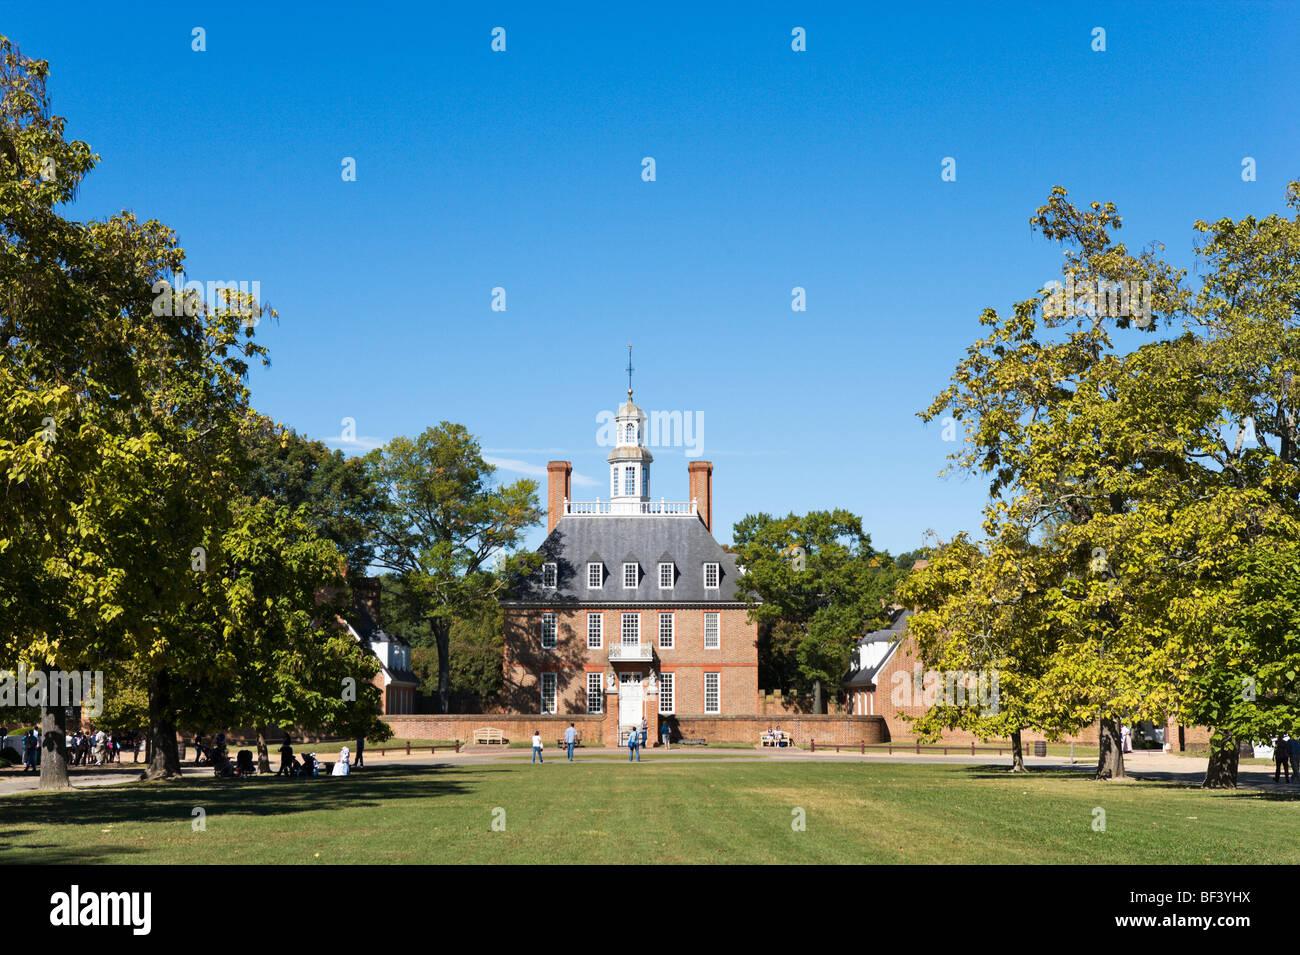 Des Gouverneurs-Palast und Palast grün, Colonial Williamsburg, Virginia, USA Stockbild